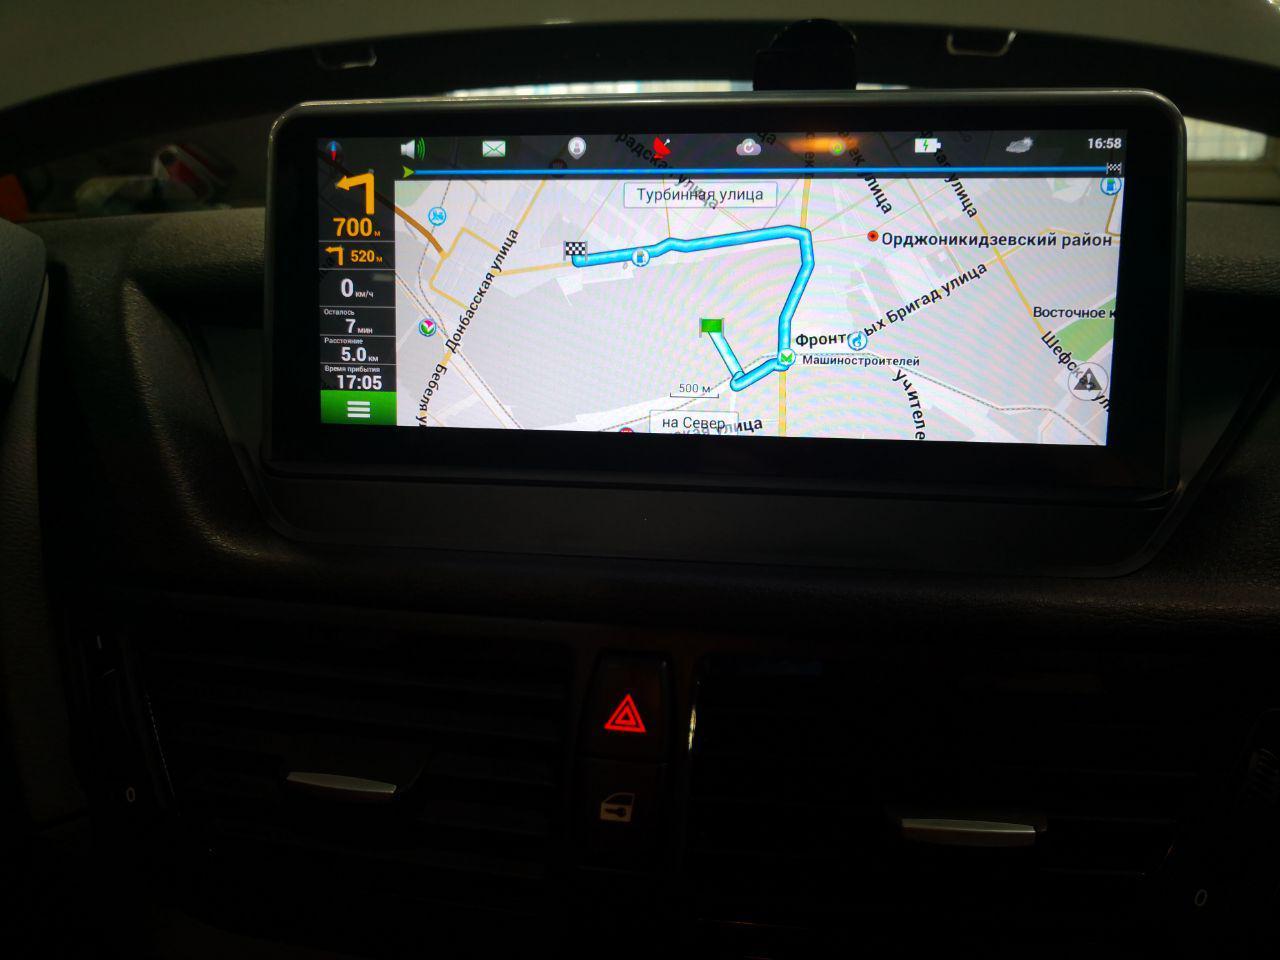 Навигация Navitel в андроид устройстве